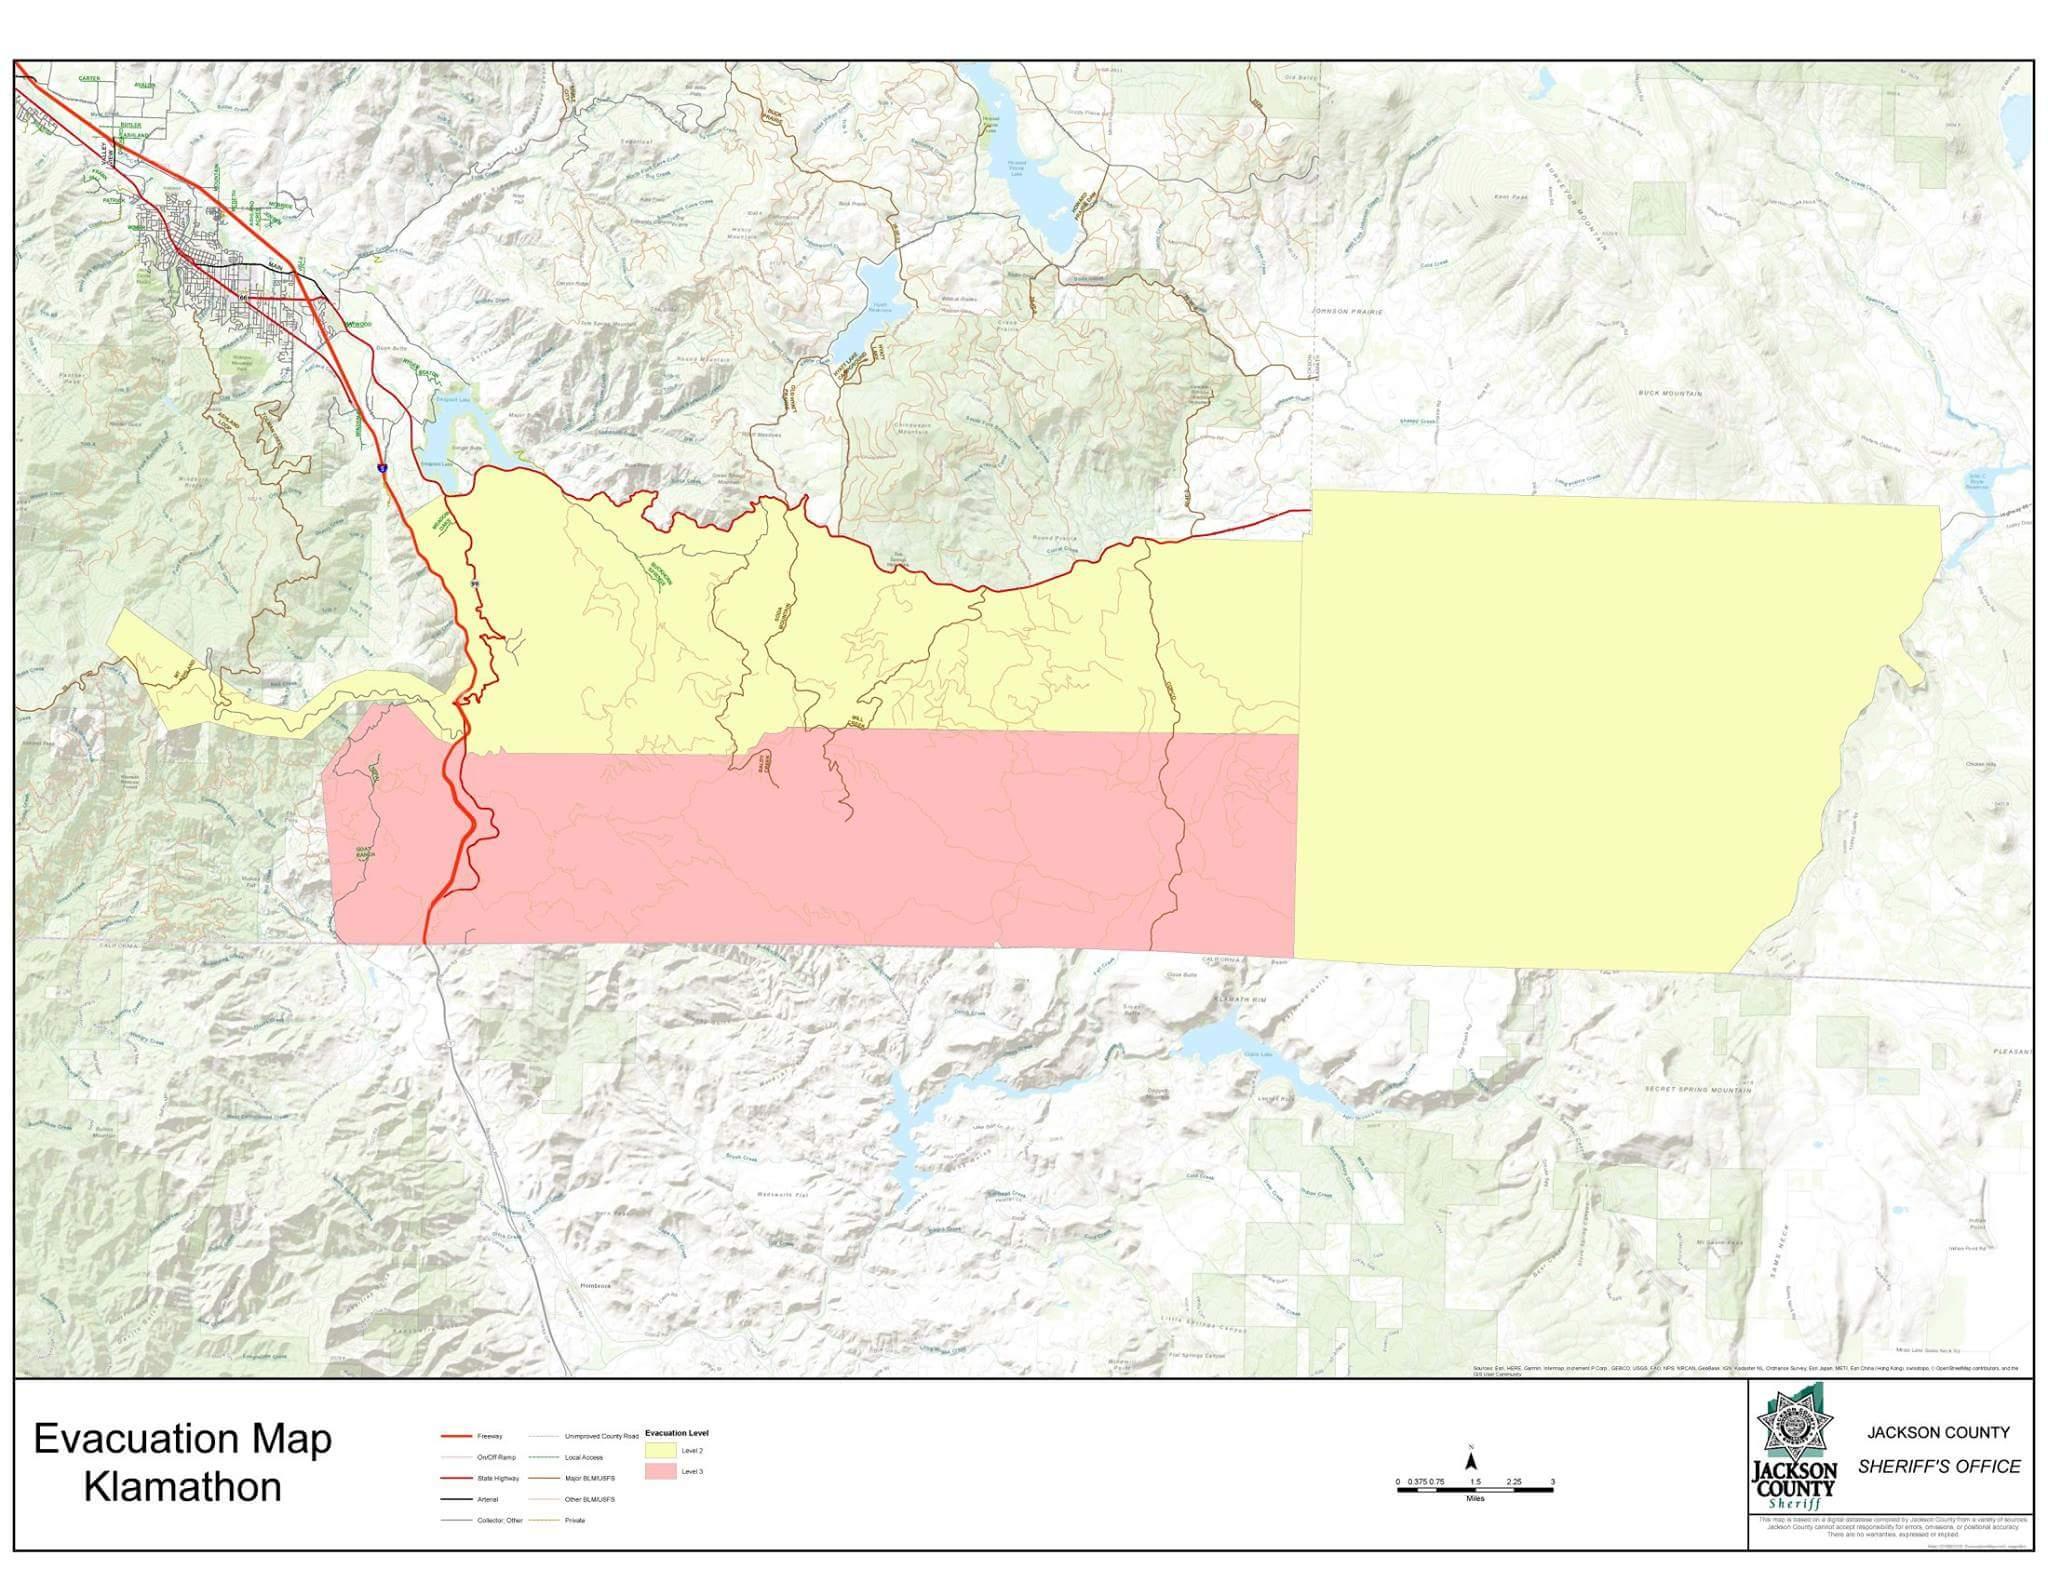 Update Klamathon Fire Evacuation Levels Kobi Tv Nbc5 Koti Tv Nbc2